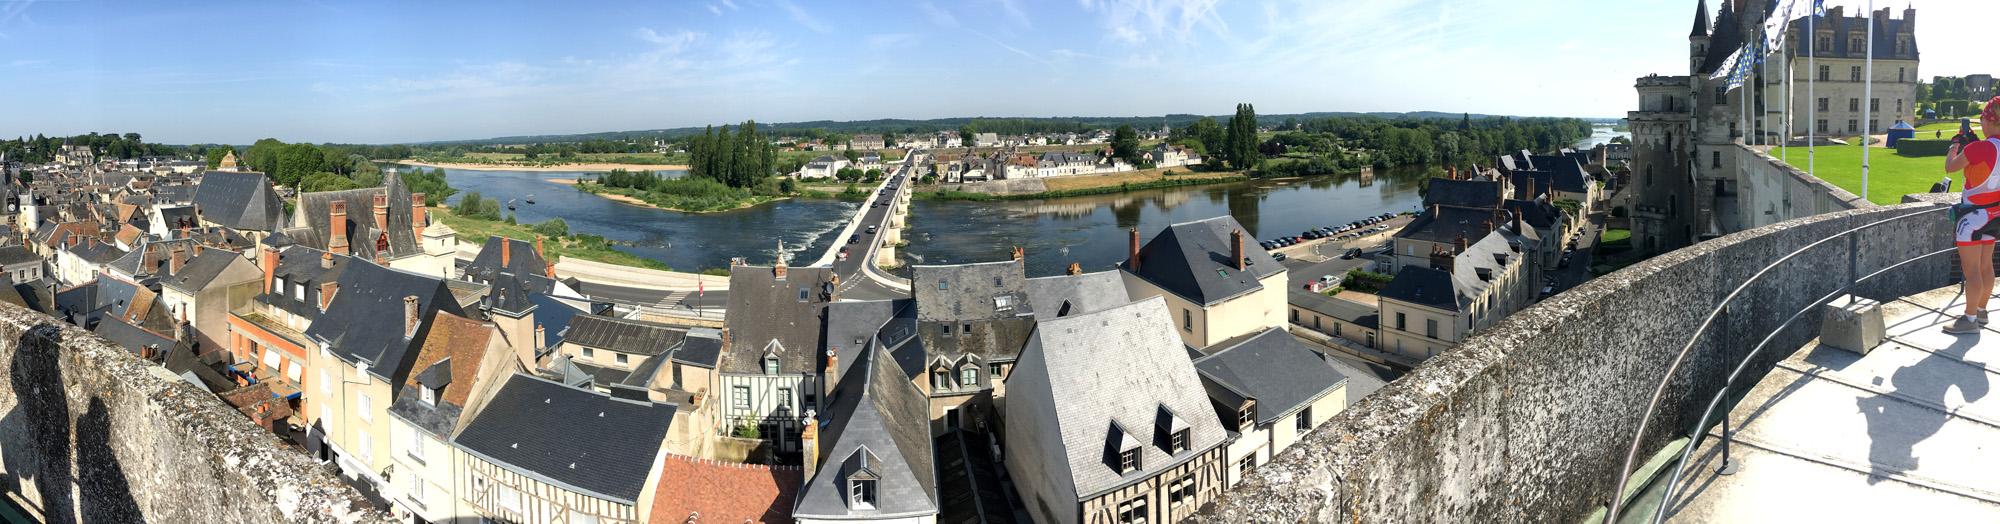 2019.06_Loire menti kerékpártúra